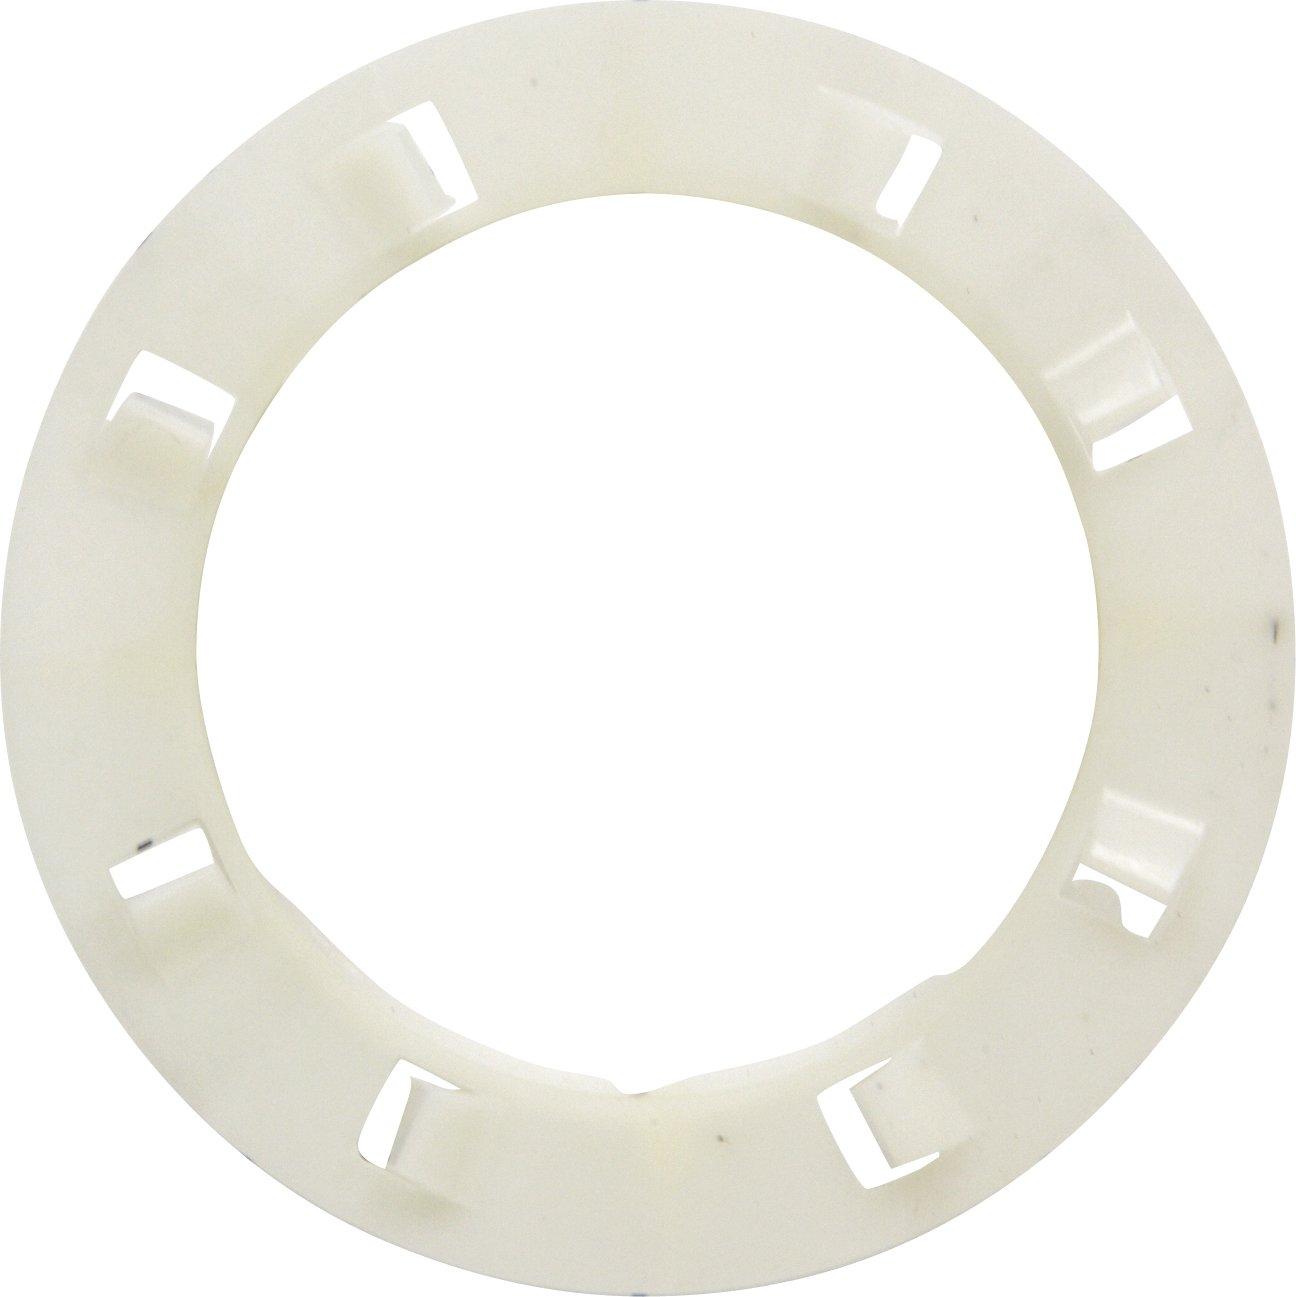 Whirlpool 285587 Washer